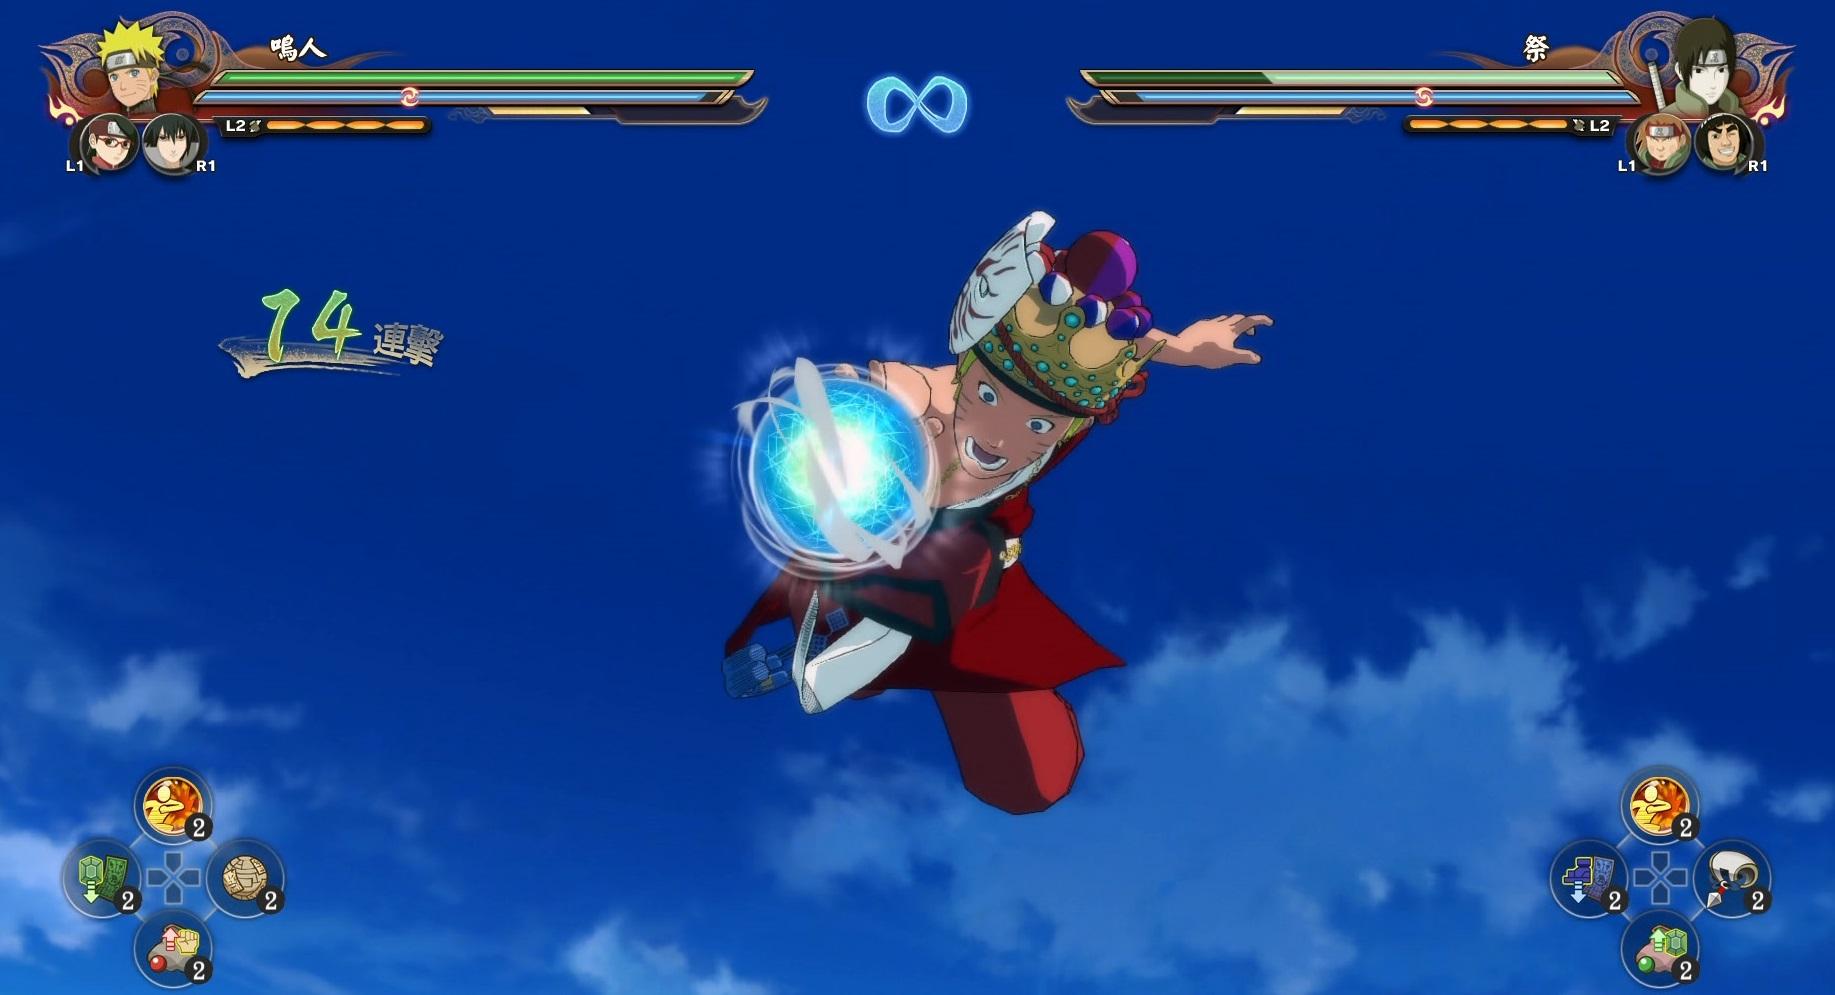 Naruto-Storm-4-traditional-3 Naruto Storm 4: Geleneksel Çin Kostümü DLC'si Duyuruldu